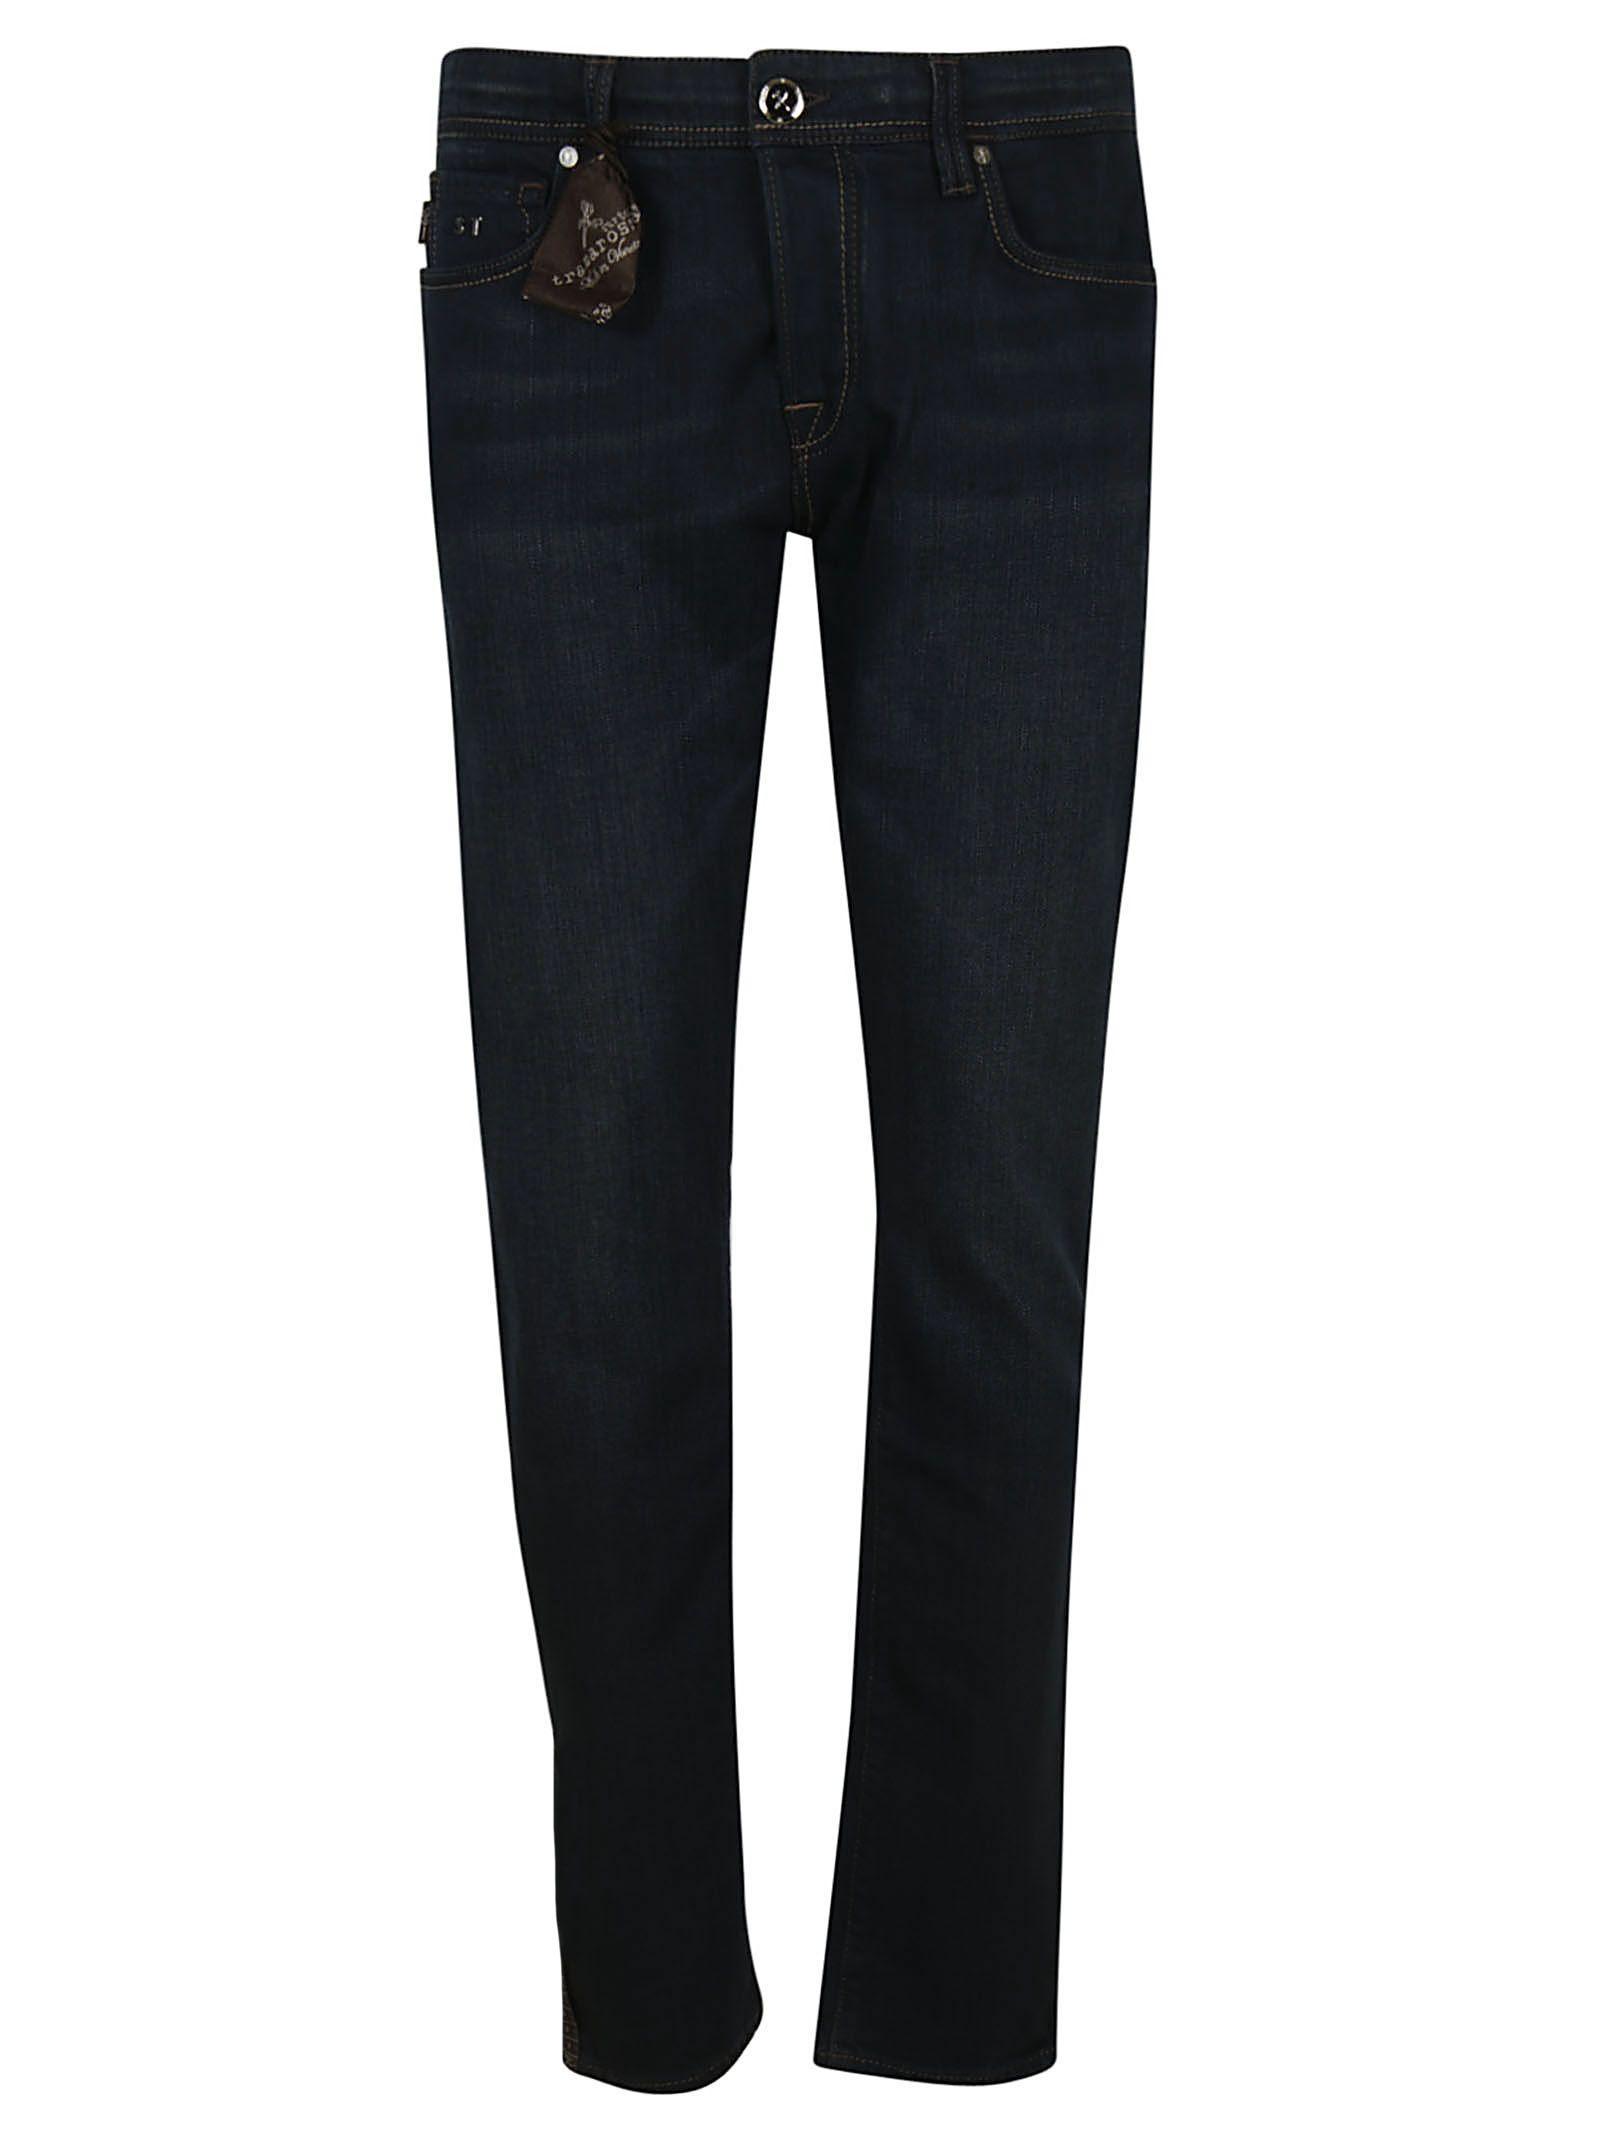 Sartoria Tramarossa Leonardo Heritage Jeans